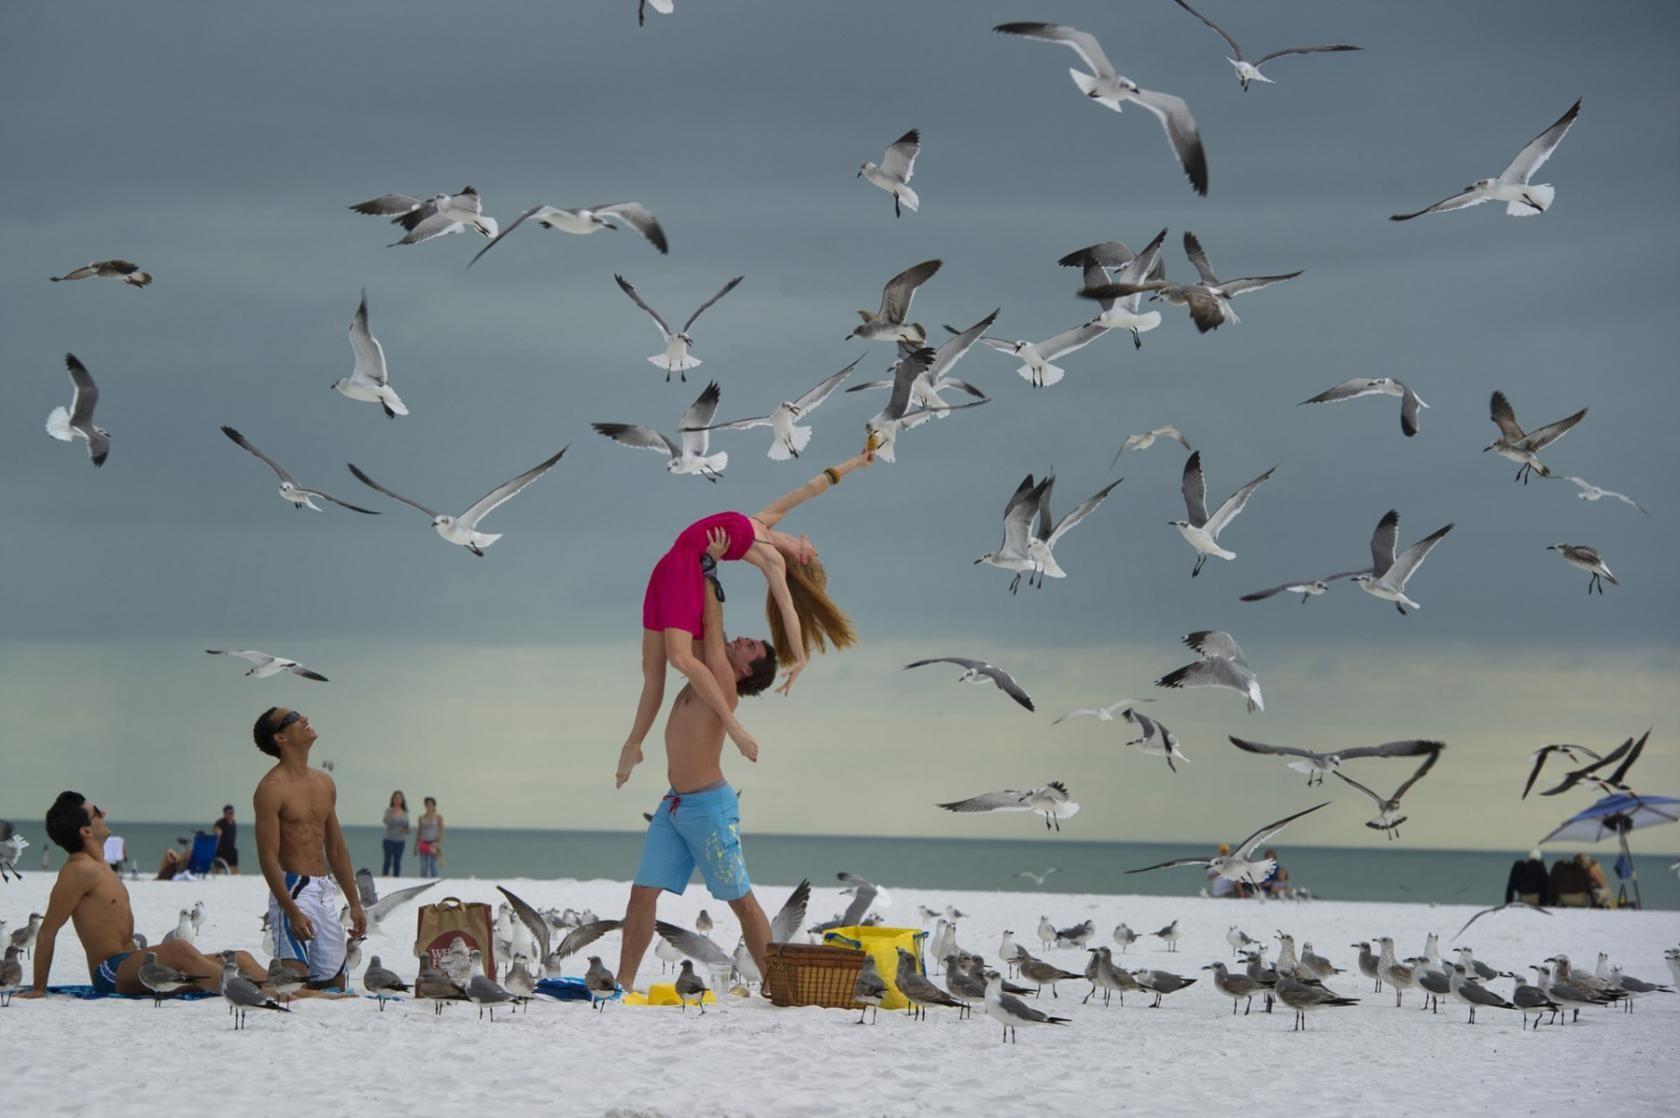 http://www.nssmag.com/data/images/galleries/5992/dancers-among-us-in-sarasota-danielle-brown62-20131011272702.jpg